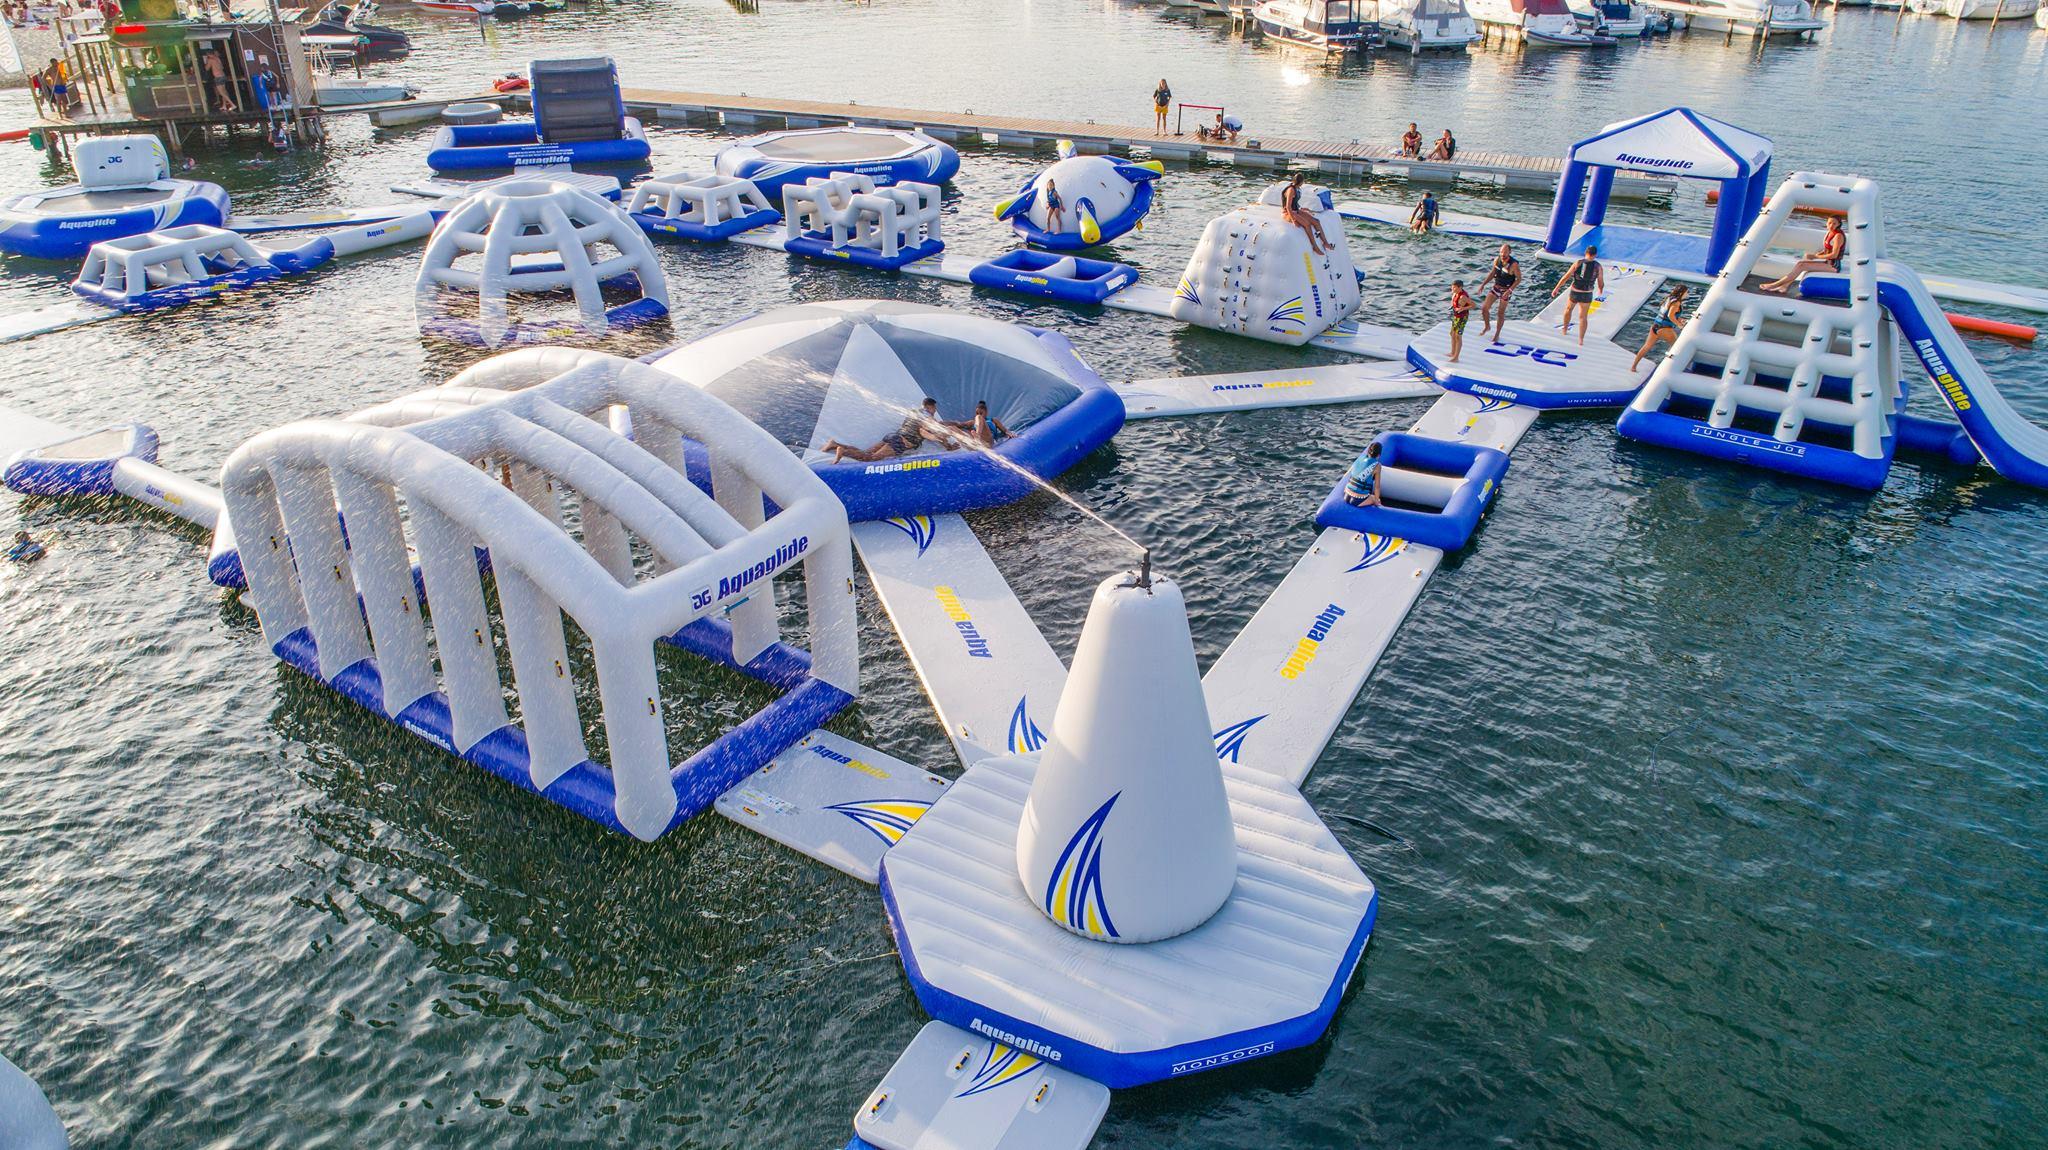 Wichita's Splash Aqua Park set to open in May